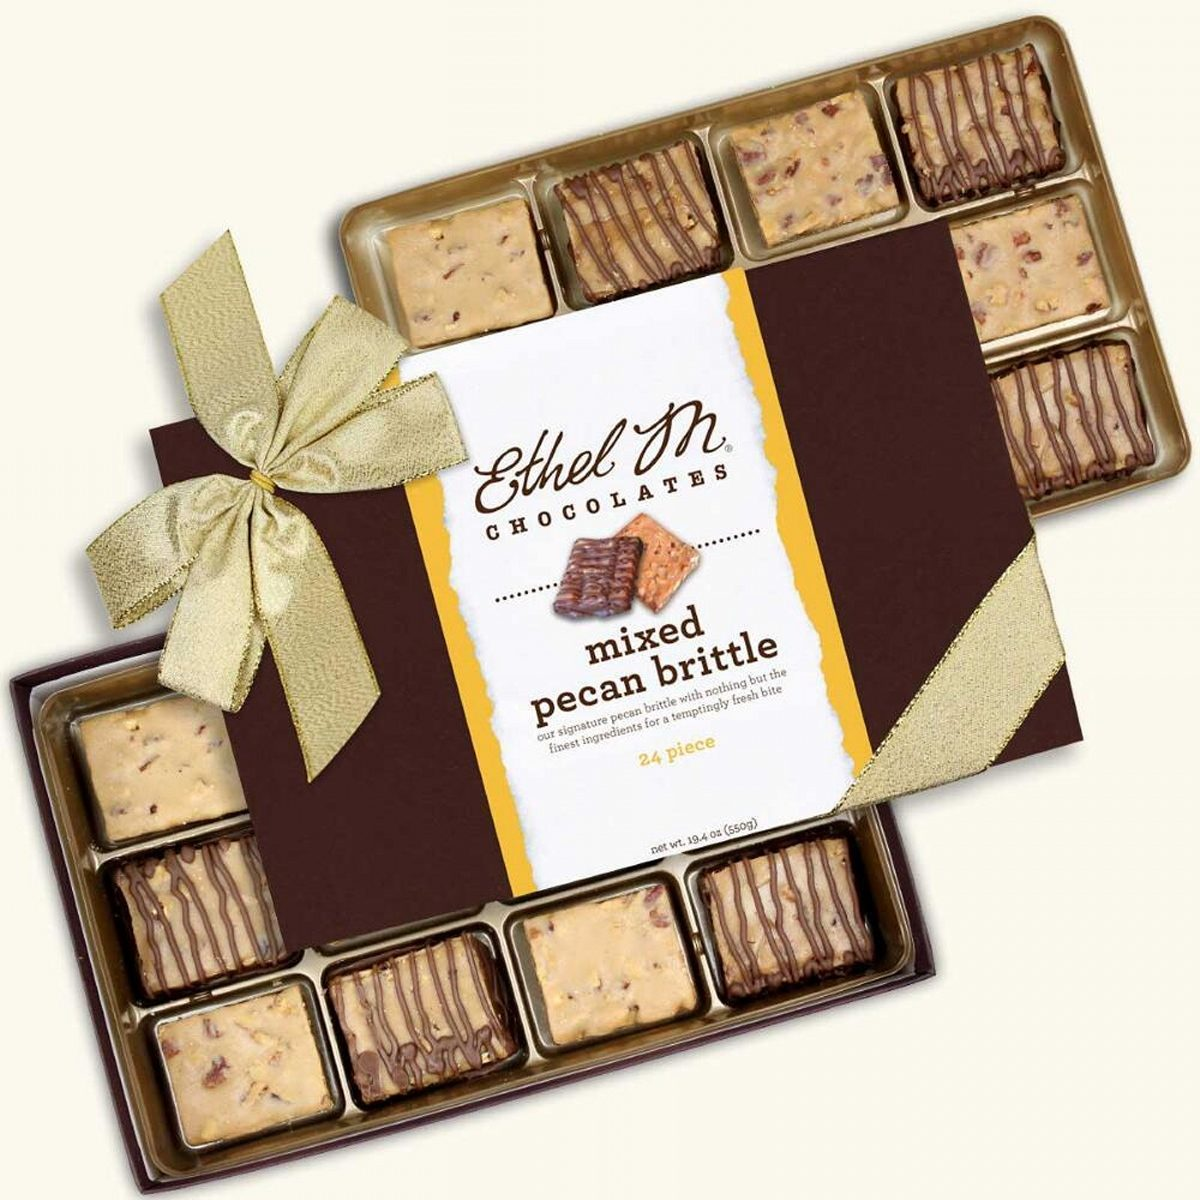 pecan brittle gift box